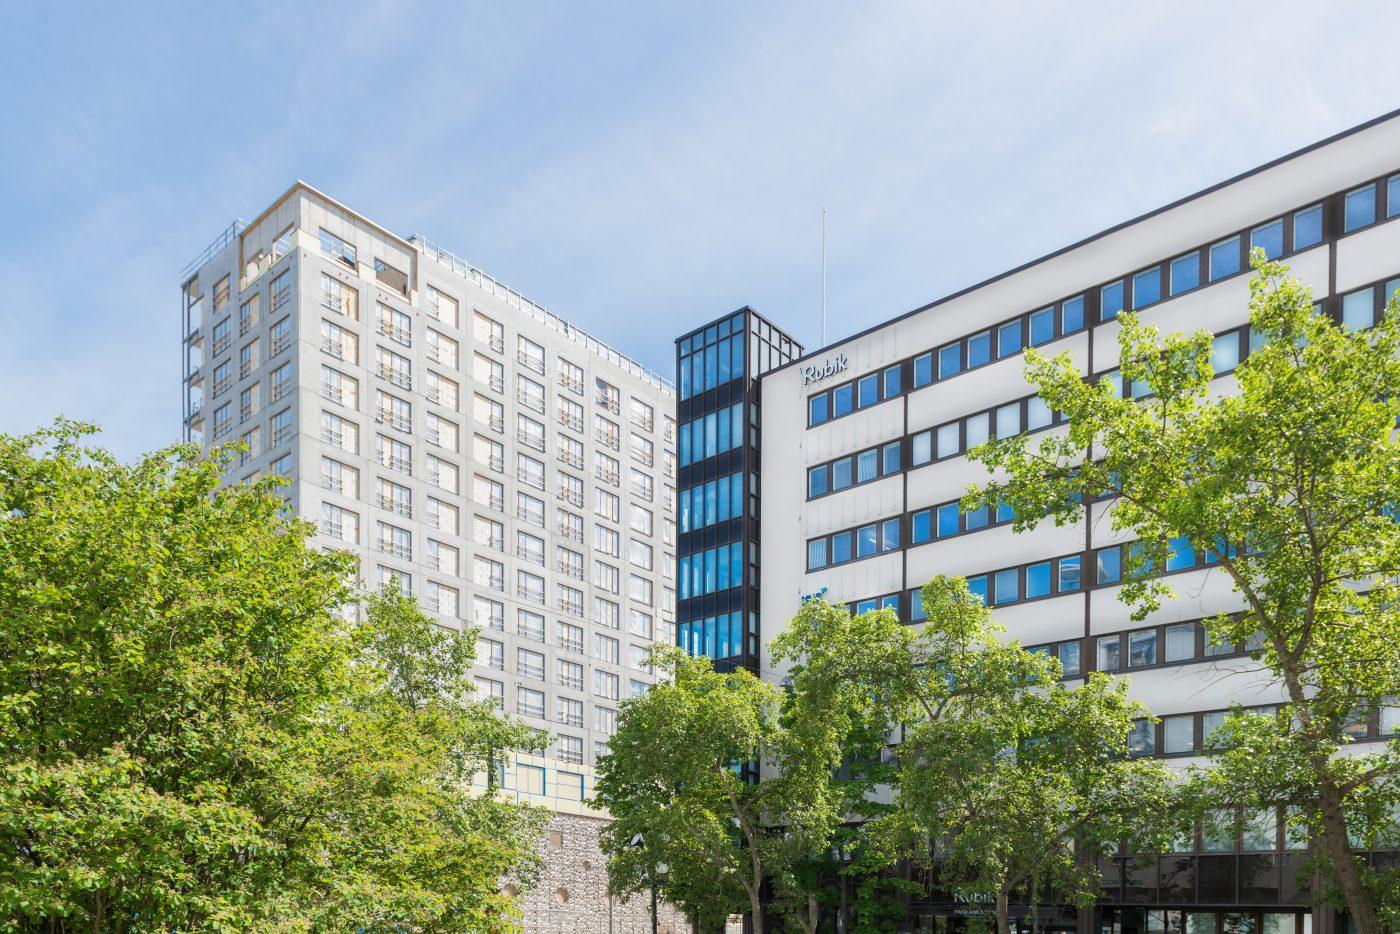 Rubik Office building